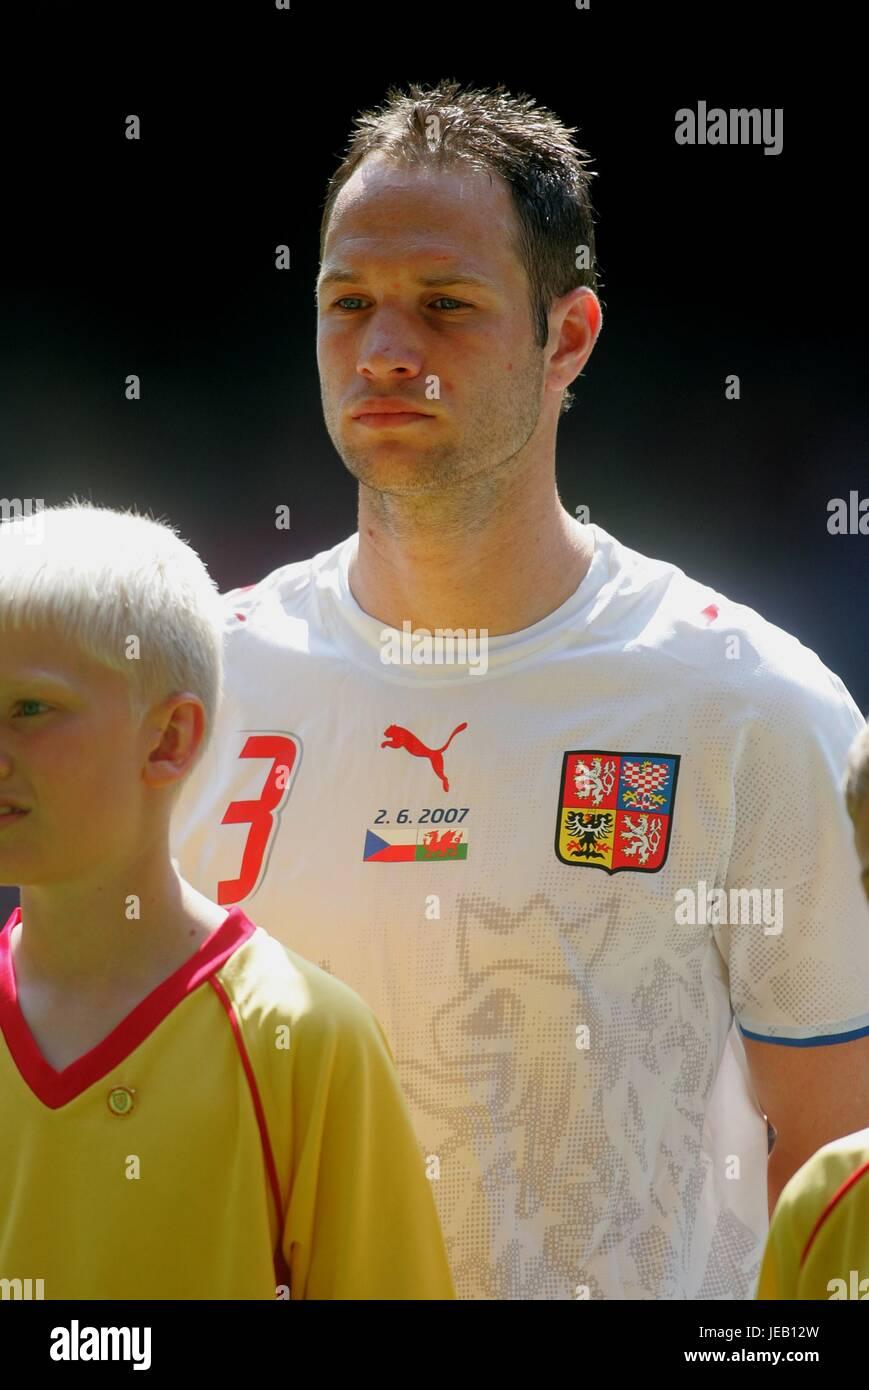 JAN POLAK Tschechien & FC Nürnberg das MILLENNIUM Stadion CARDIFF WALES 2. Juni 2007 Stockbild